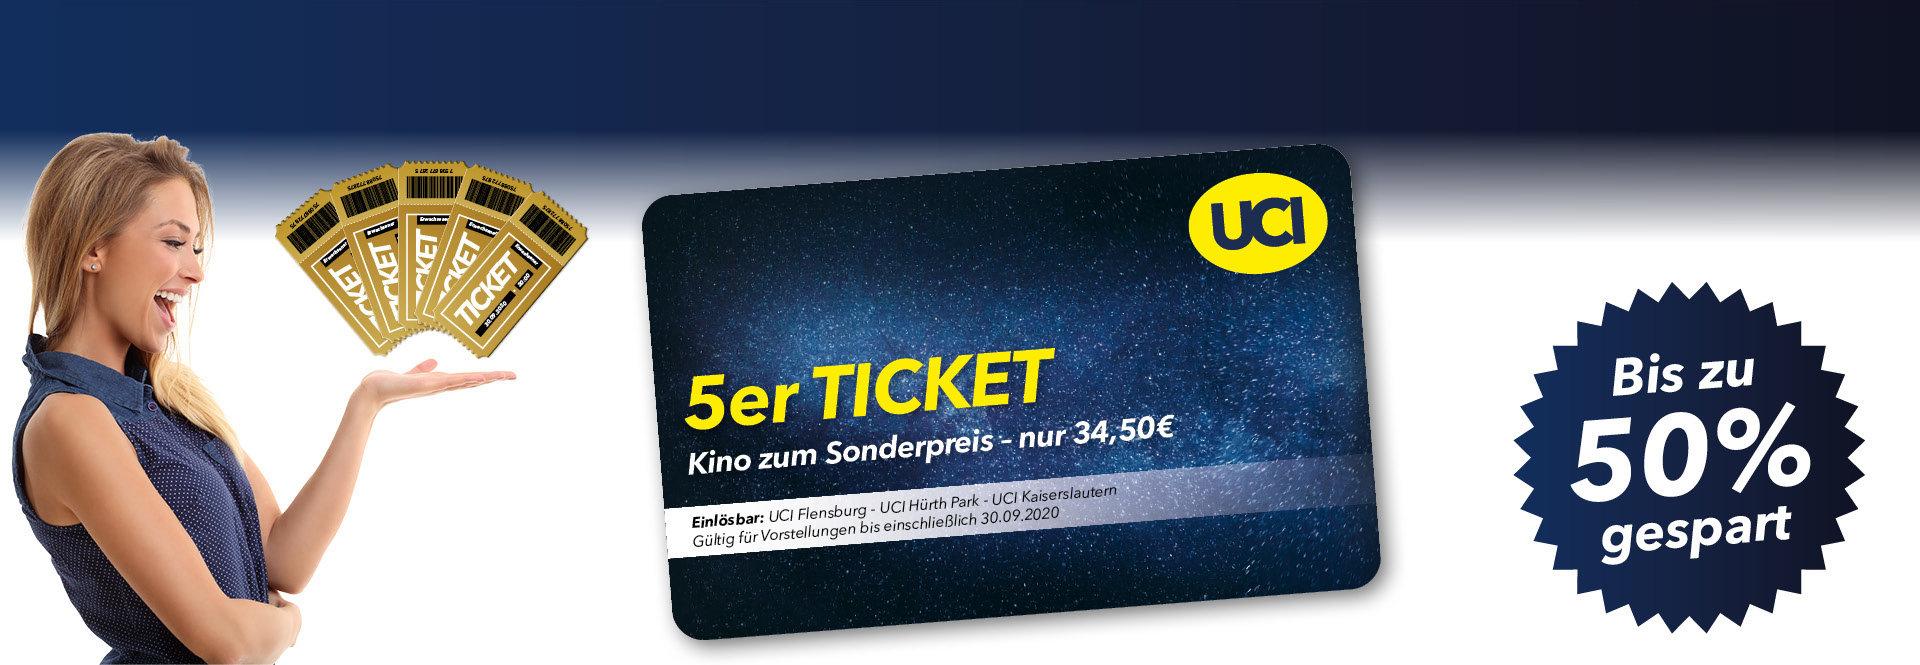 (Lokal) 5 Tickets für 34,50 - 6,90€ pro Kinoticket